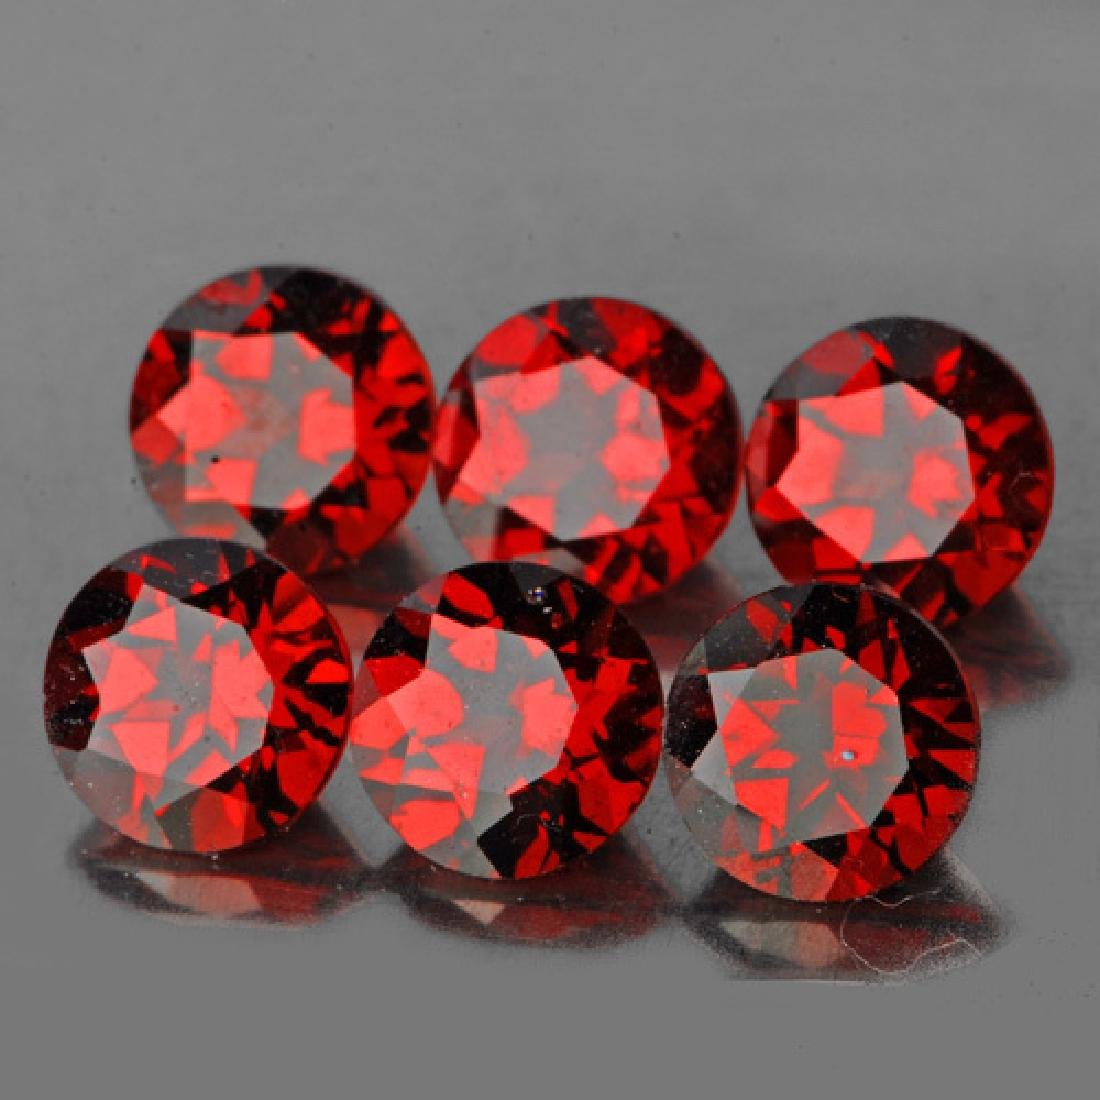 Natural Red Mozambique Garnet 7.22 ct {Flawless-VVS1)